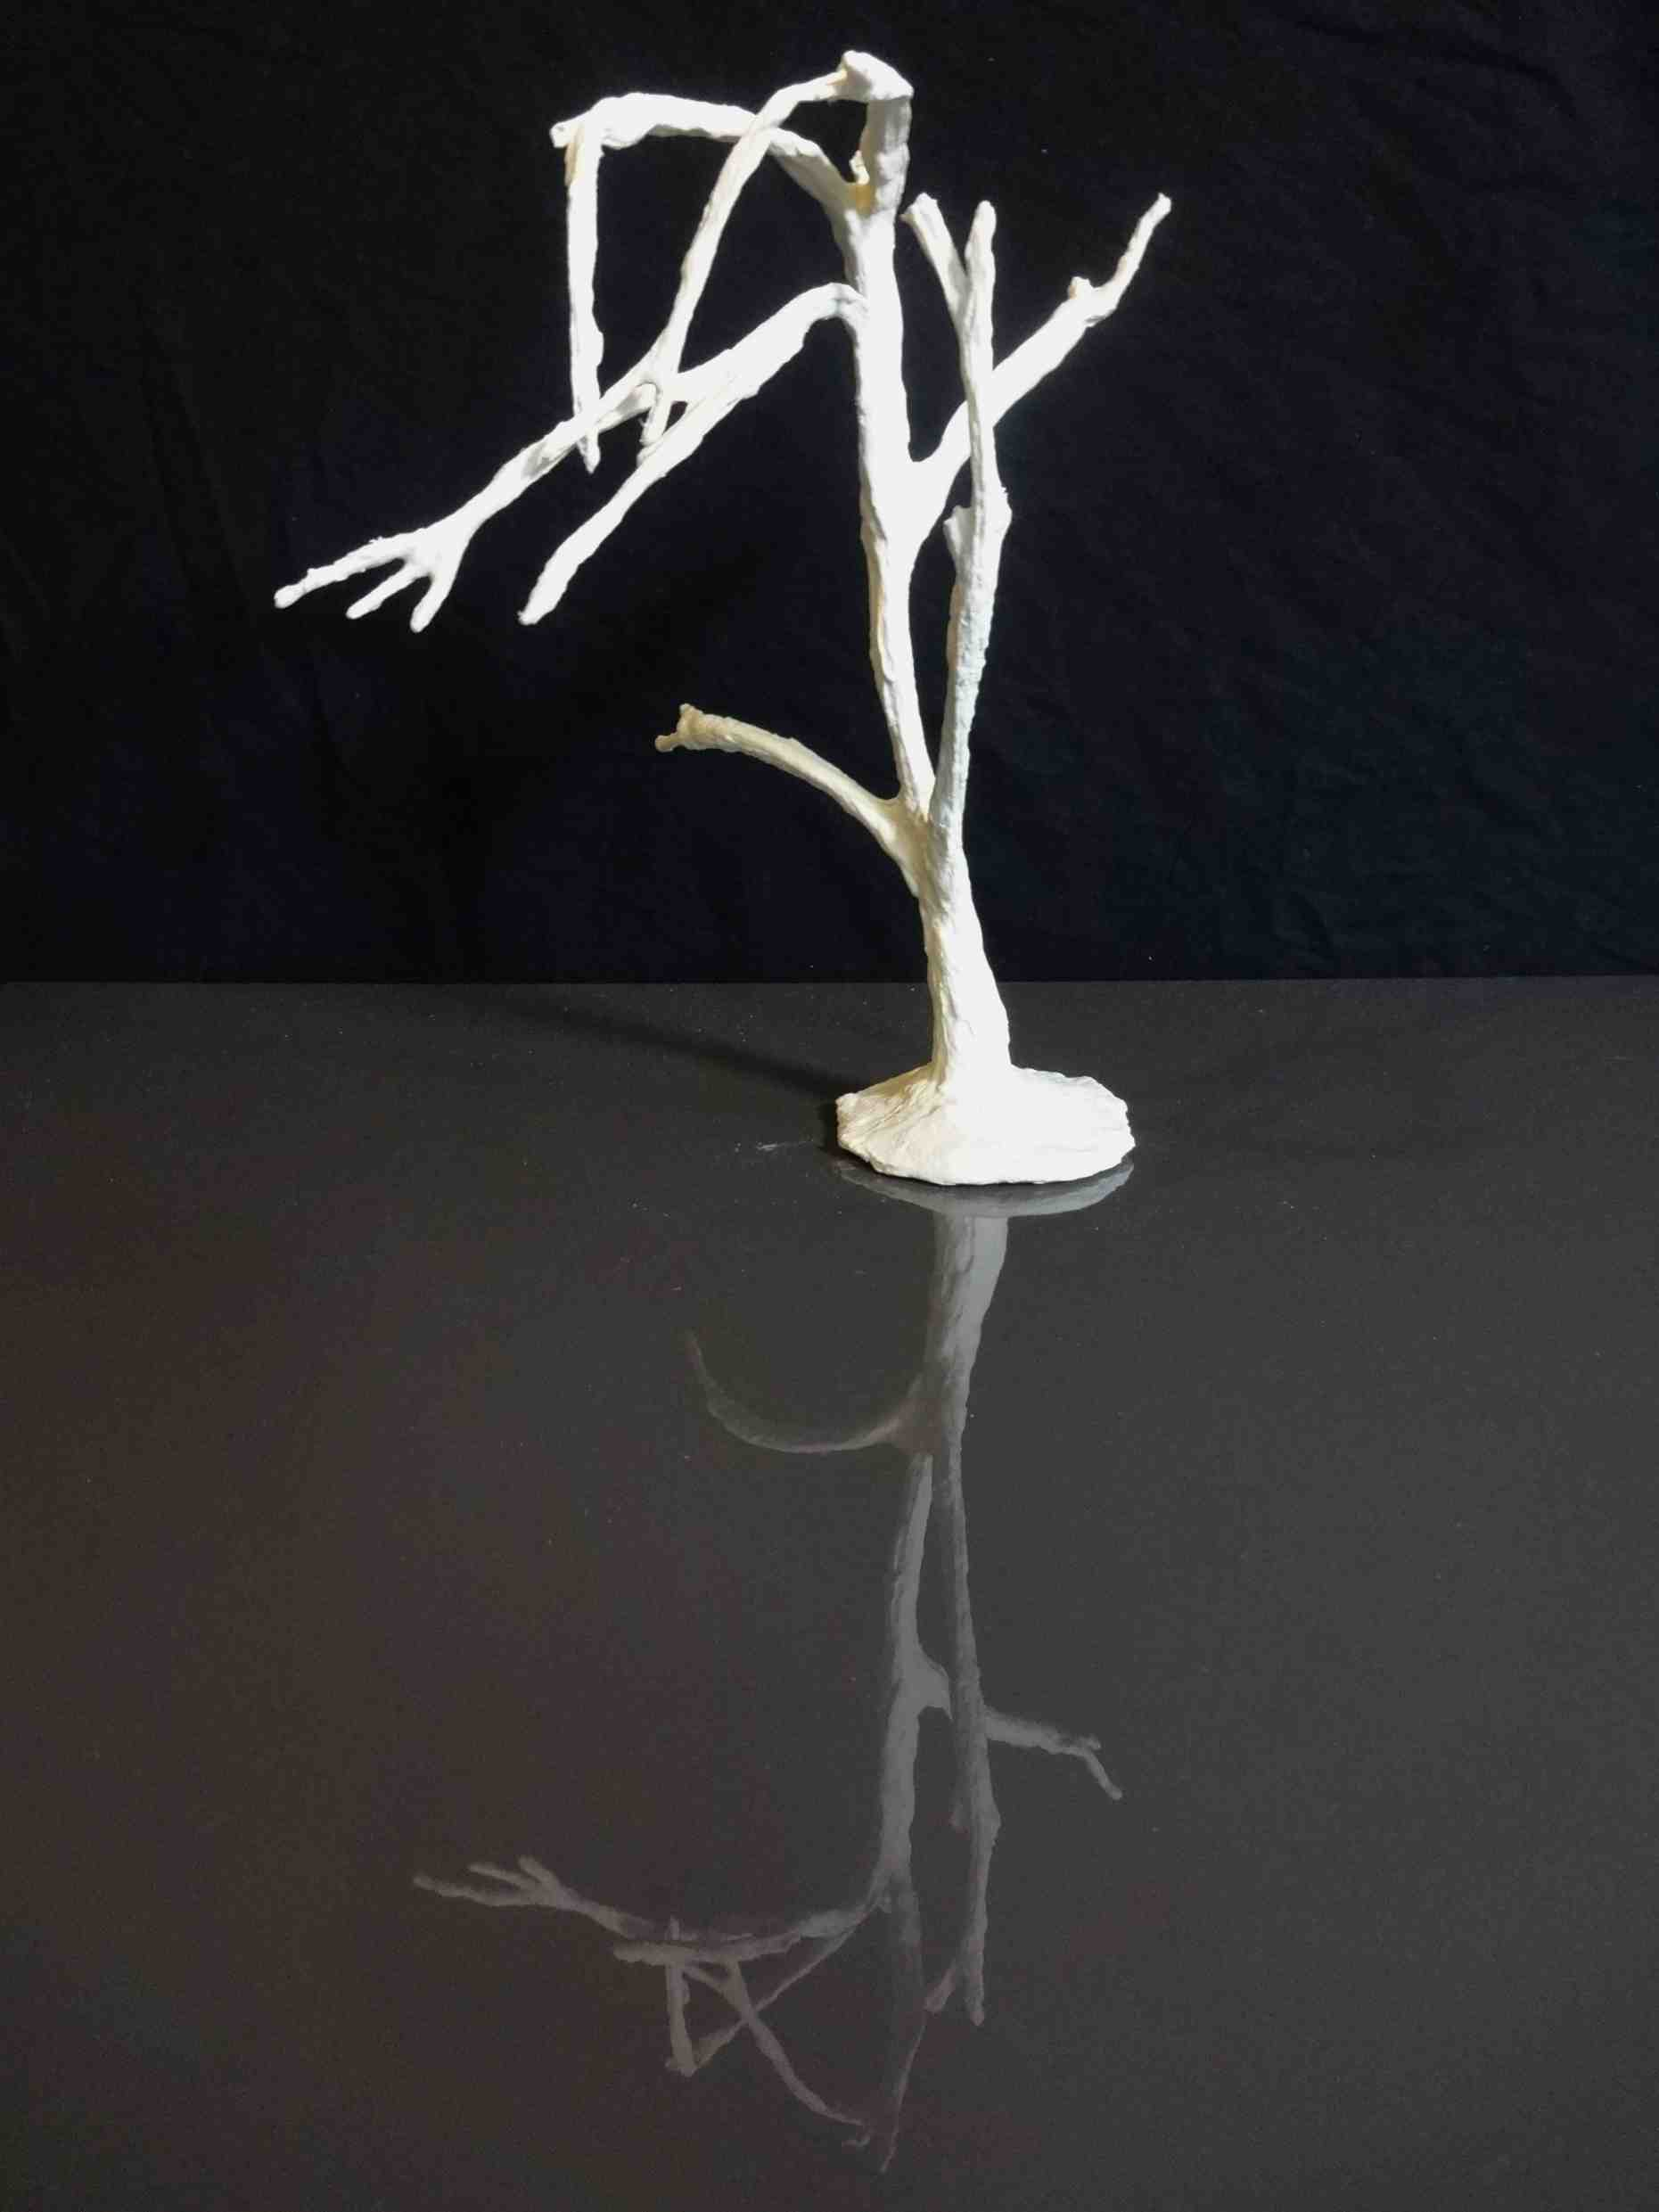 cat-trochu-ceramic-rennes-sculptures-27aout-sculpturelibre 14